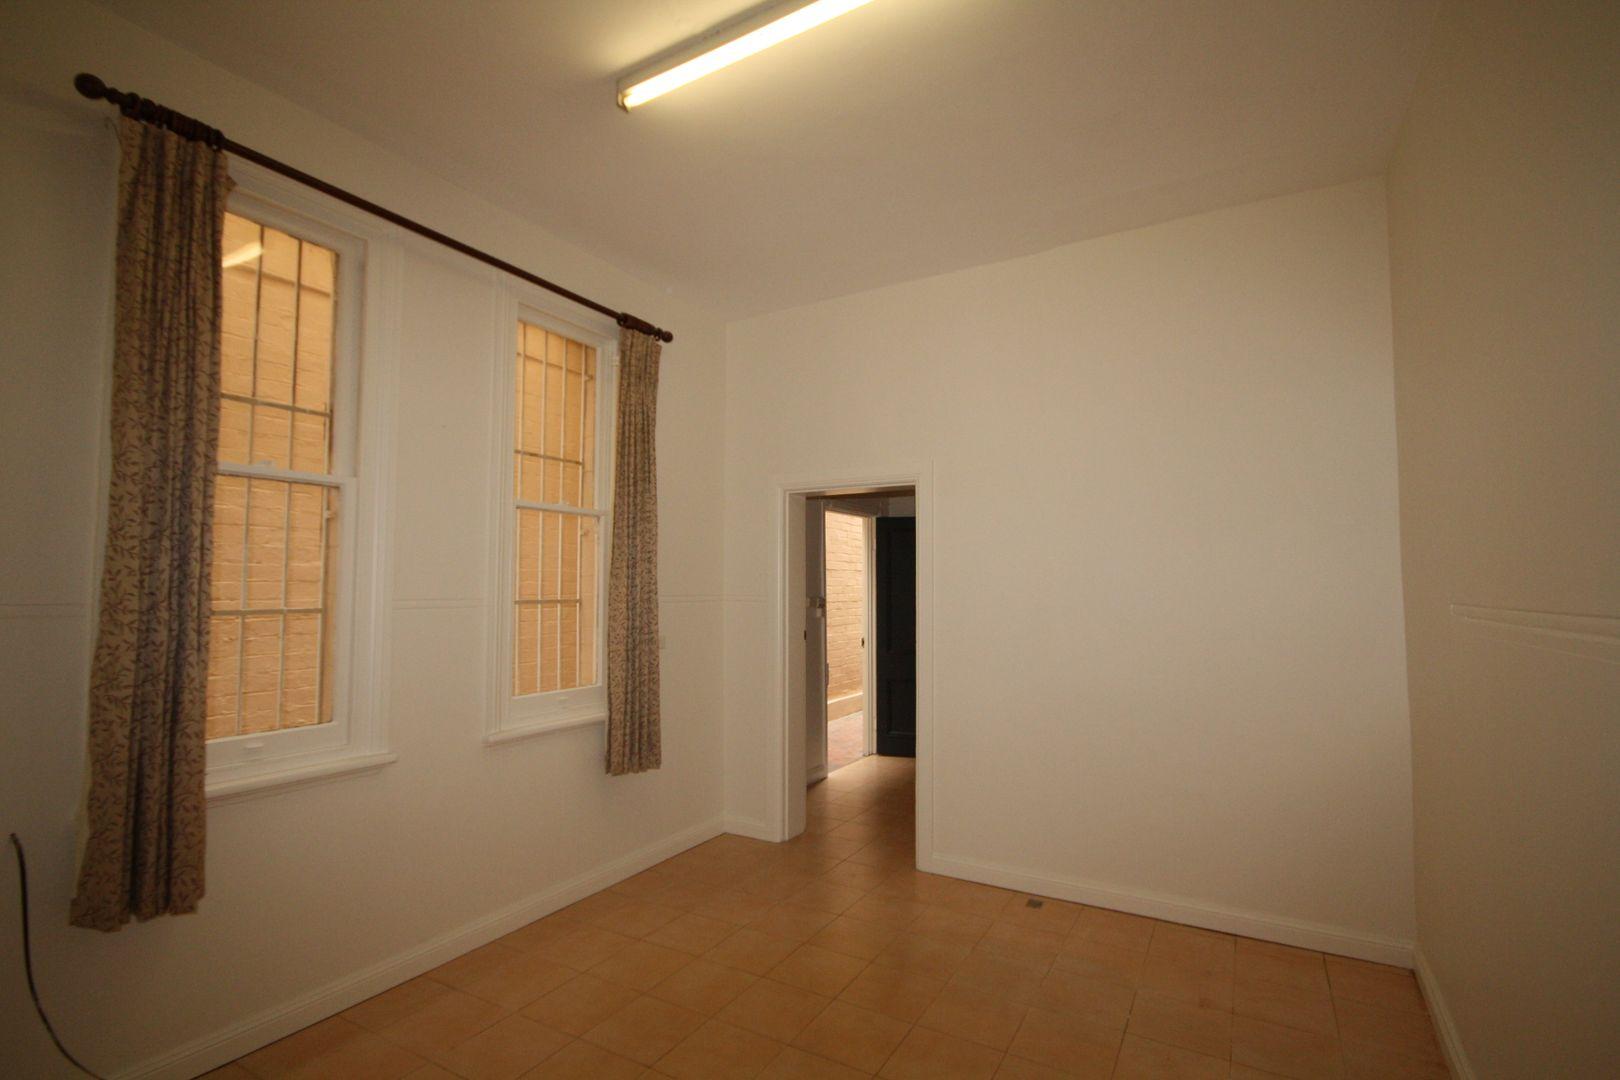 3/114 Percival Lane, Stanmore NSW 2048, Image 0